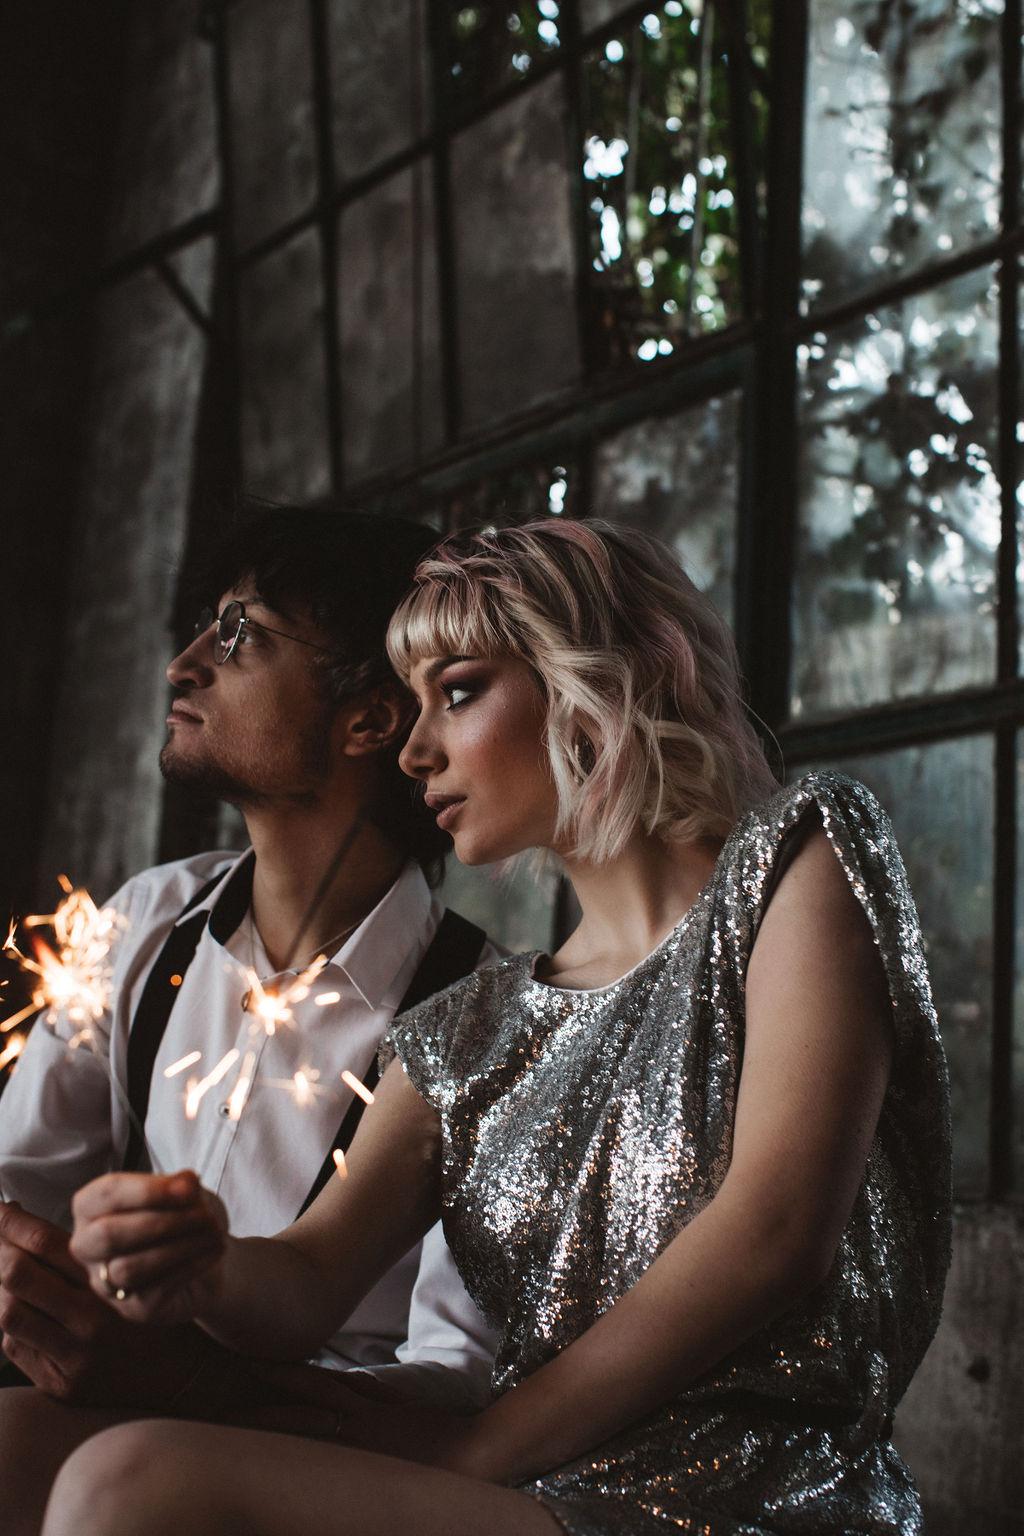 modern industrial wedding - alternative wedding - unconventional wedding - edgy wedding - bride and groom with sparklers - creative wedding photography